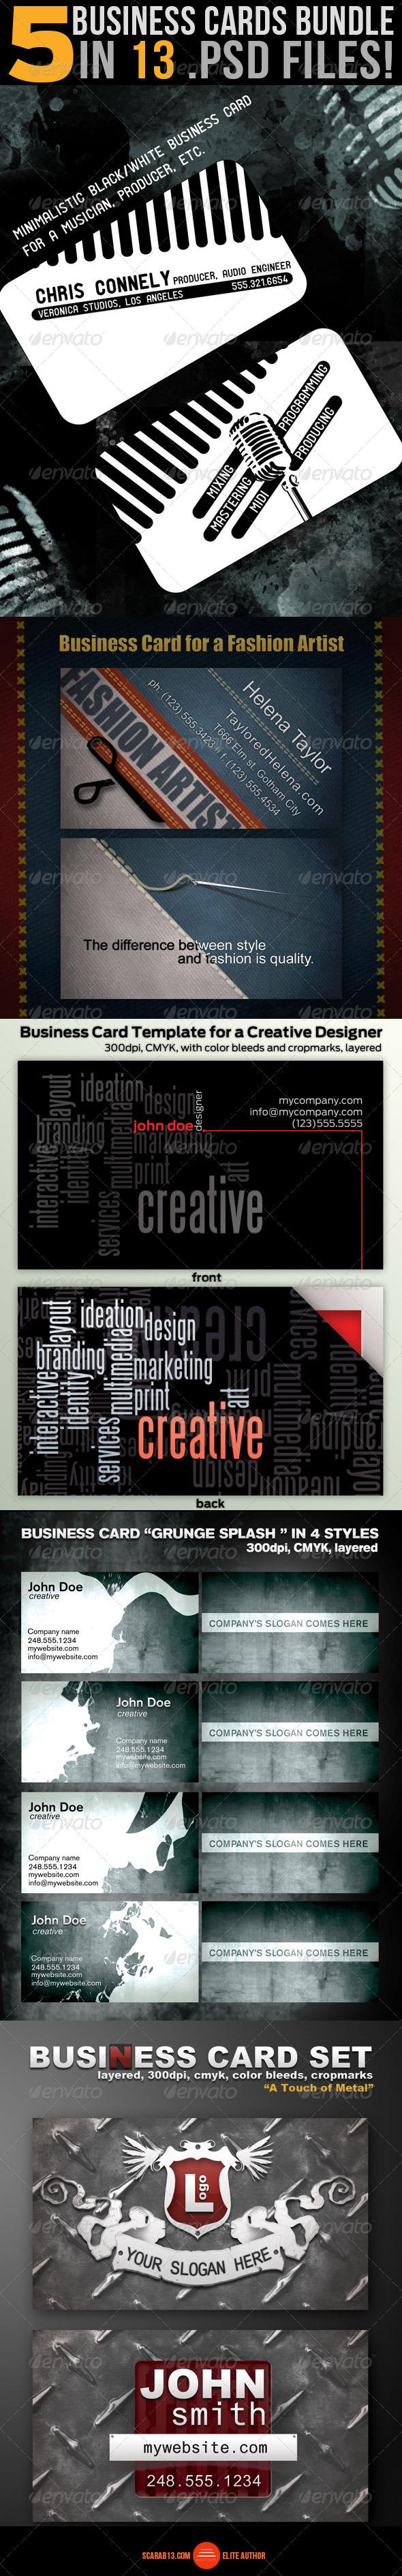 5 Business Card Design Bundle - Business Cards Print Templates